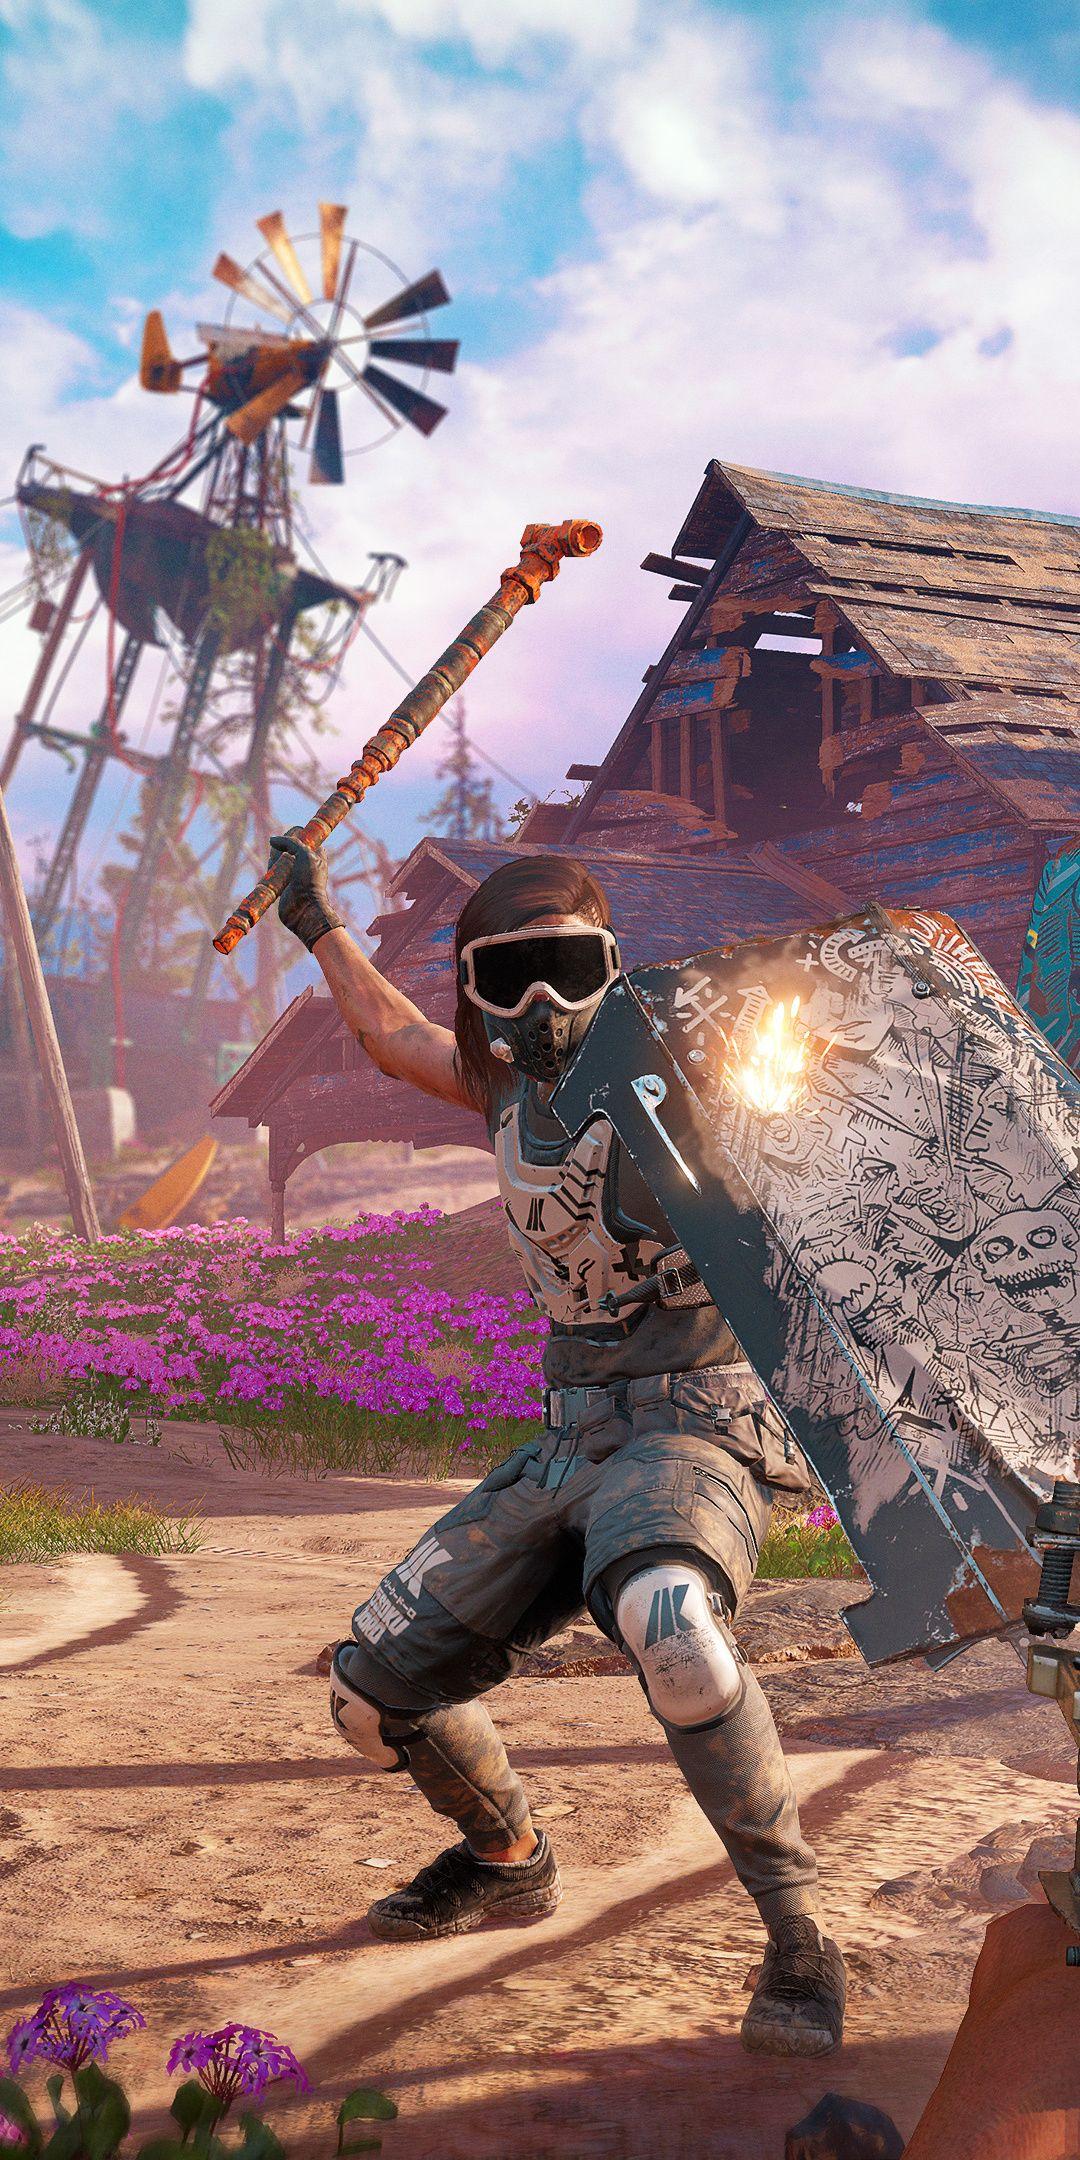 Far Cry New Dawn Video Game 2018 Fight 1080x2160 Wallpaper